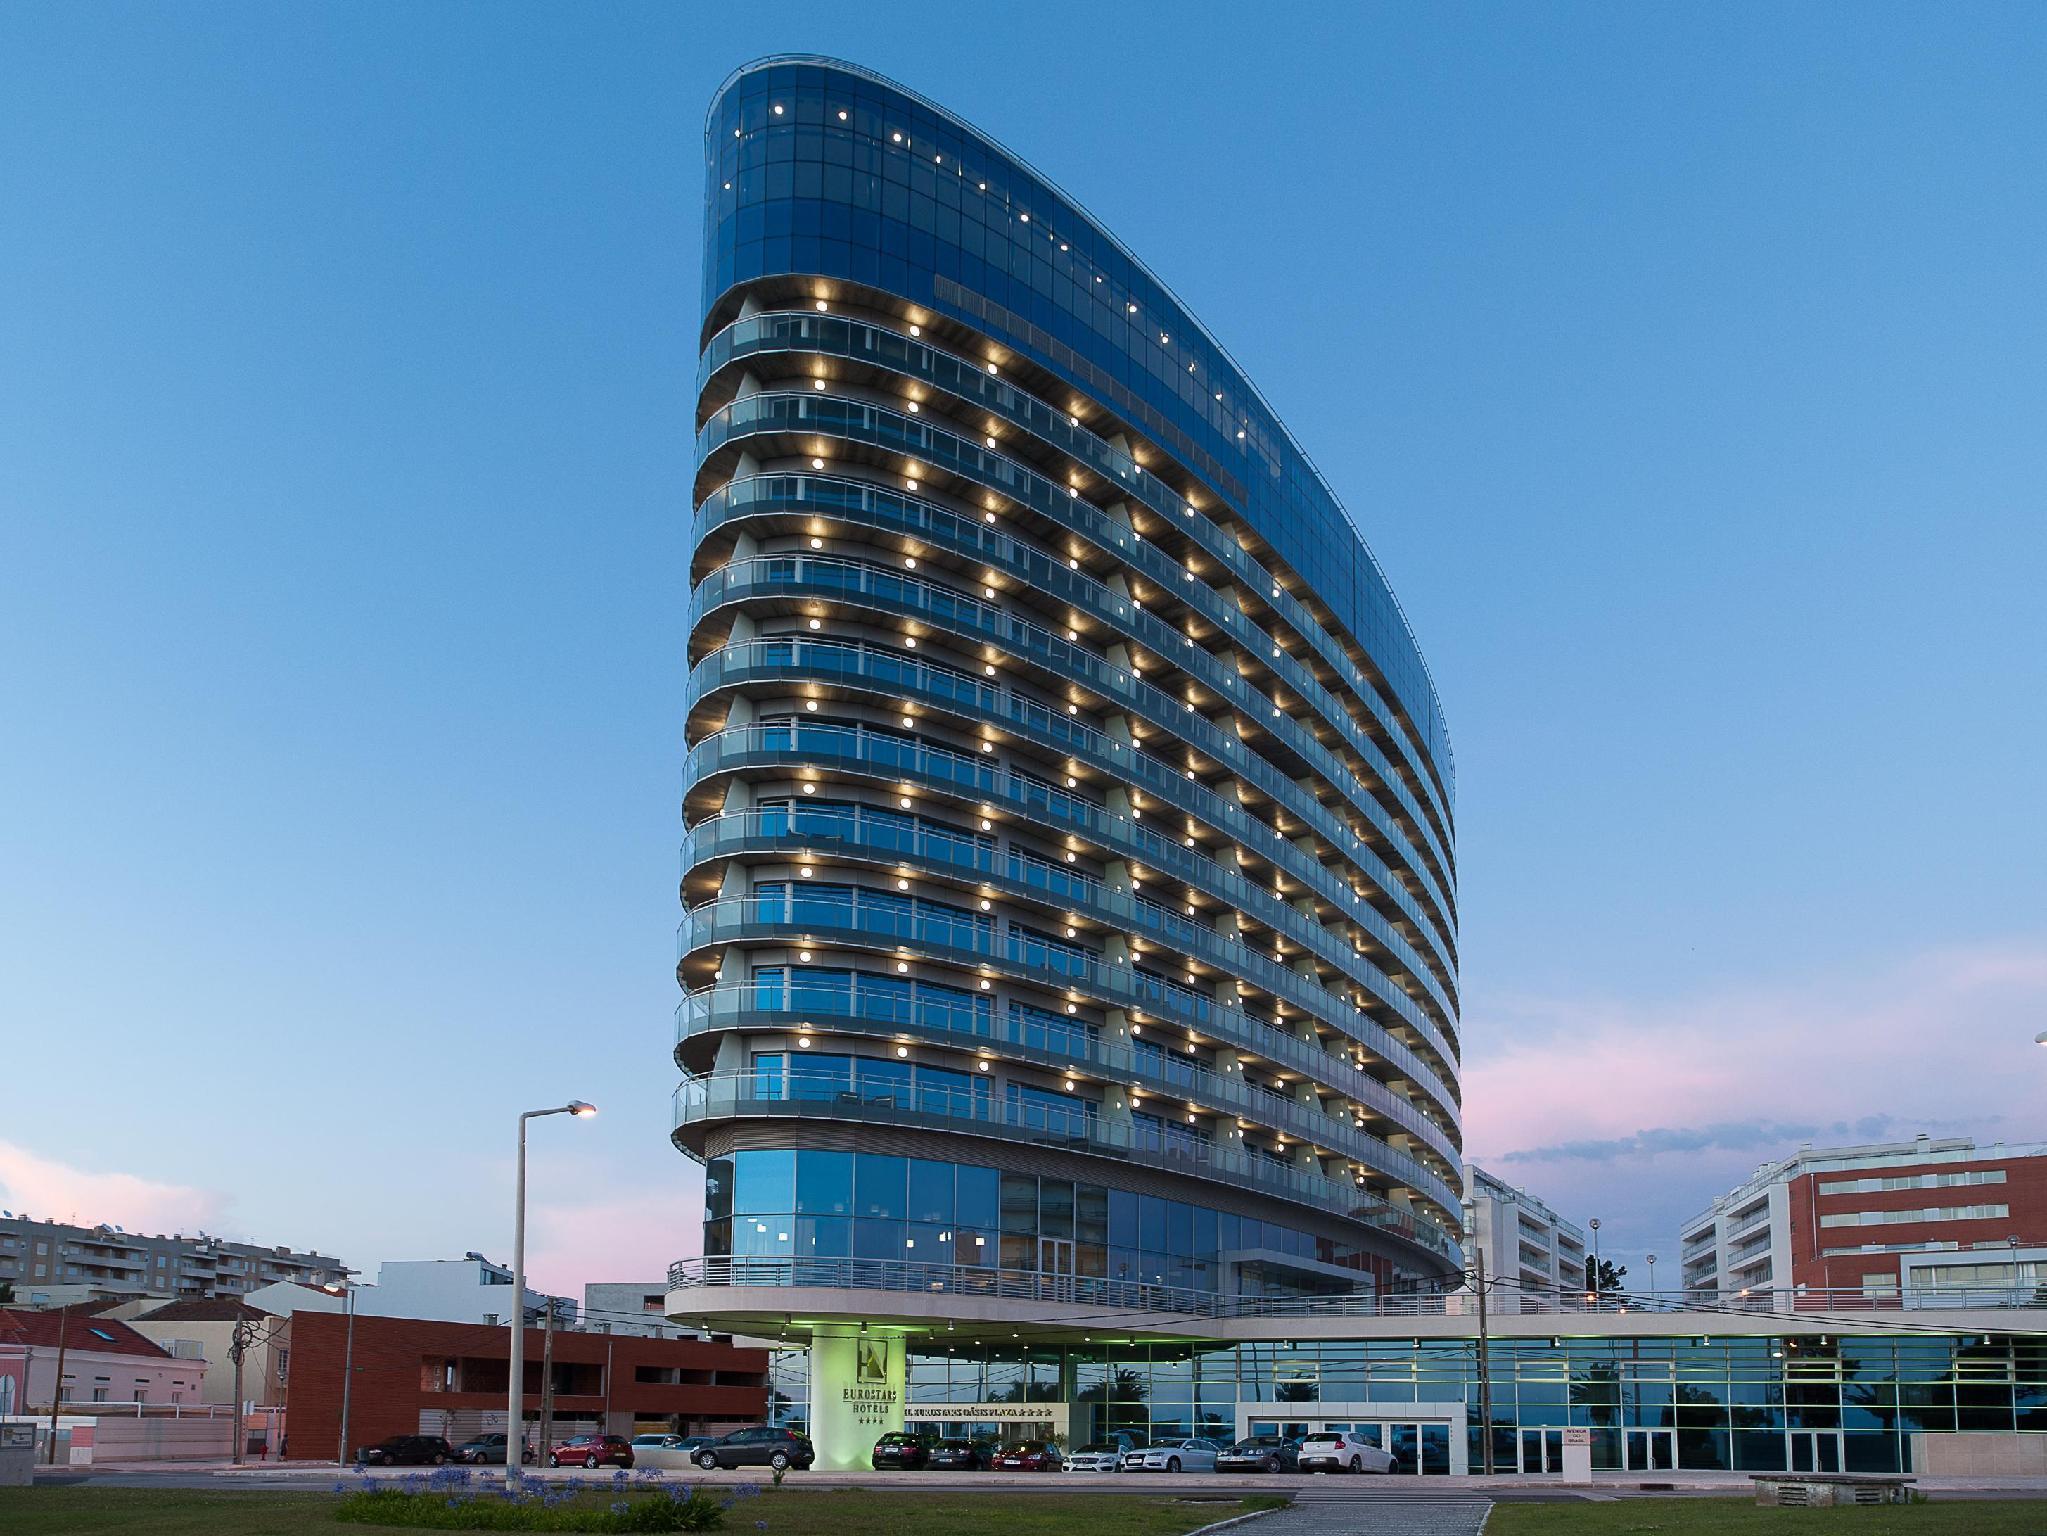 Eurostars Oasis Plaza Hotel